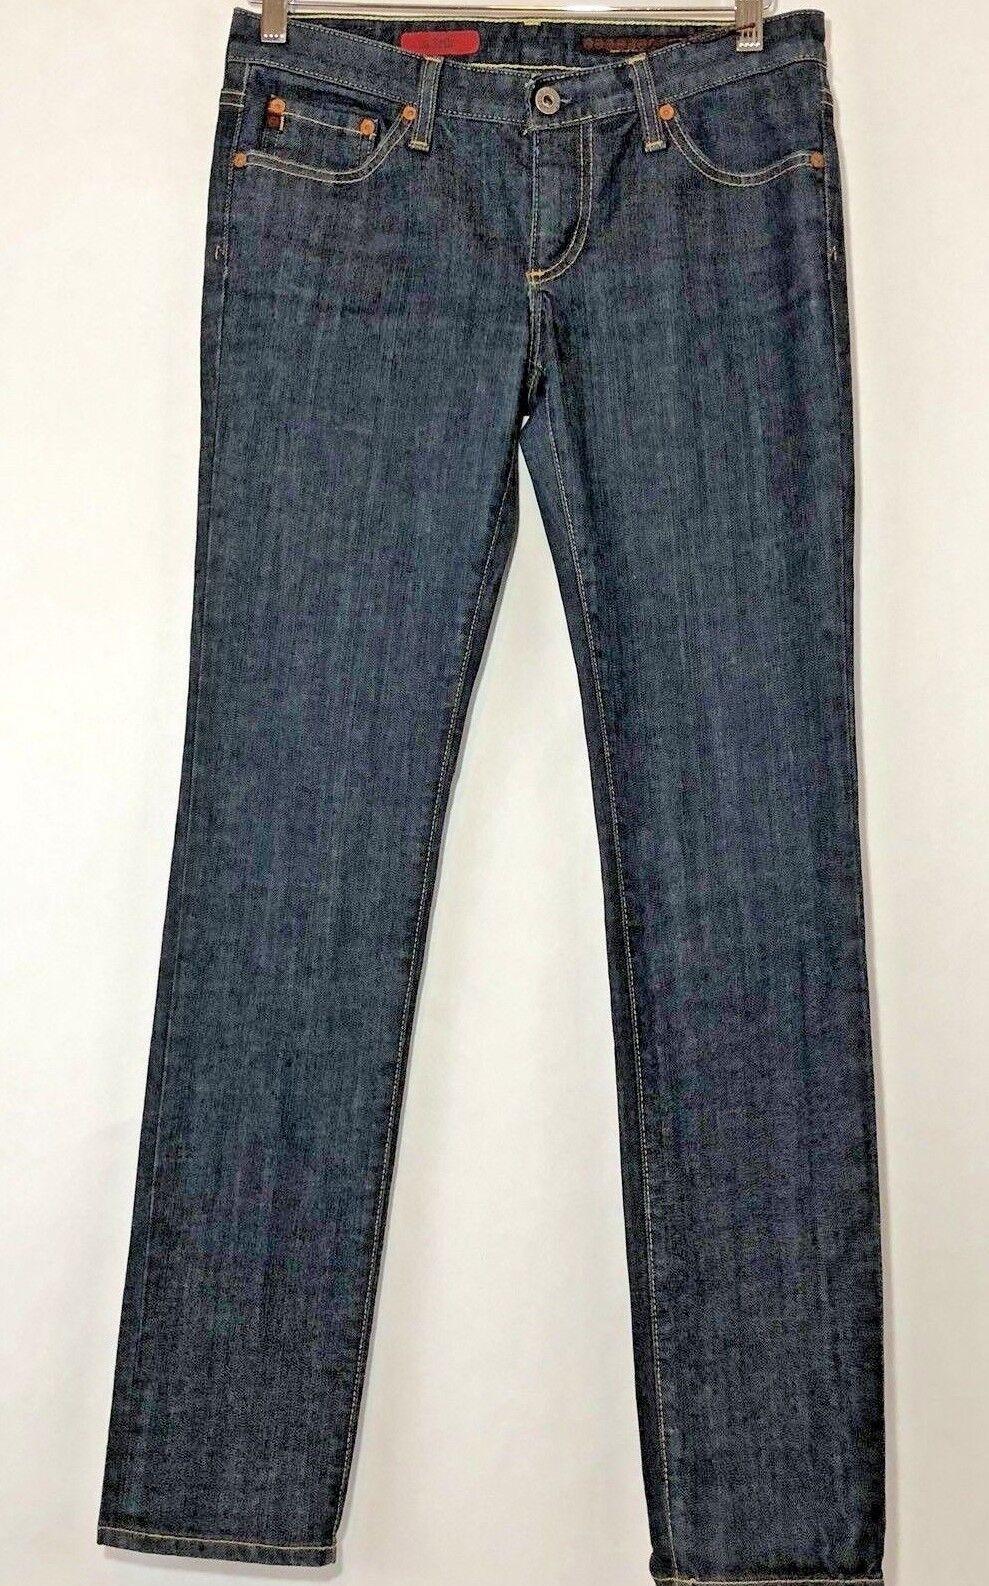 AG Adriano goldschmied Womens Size 27R Jeans The Stilt Cigarette Leg Dark Wash